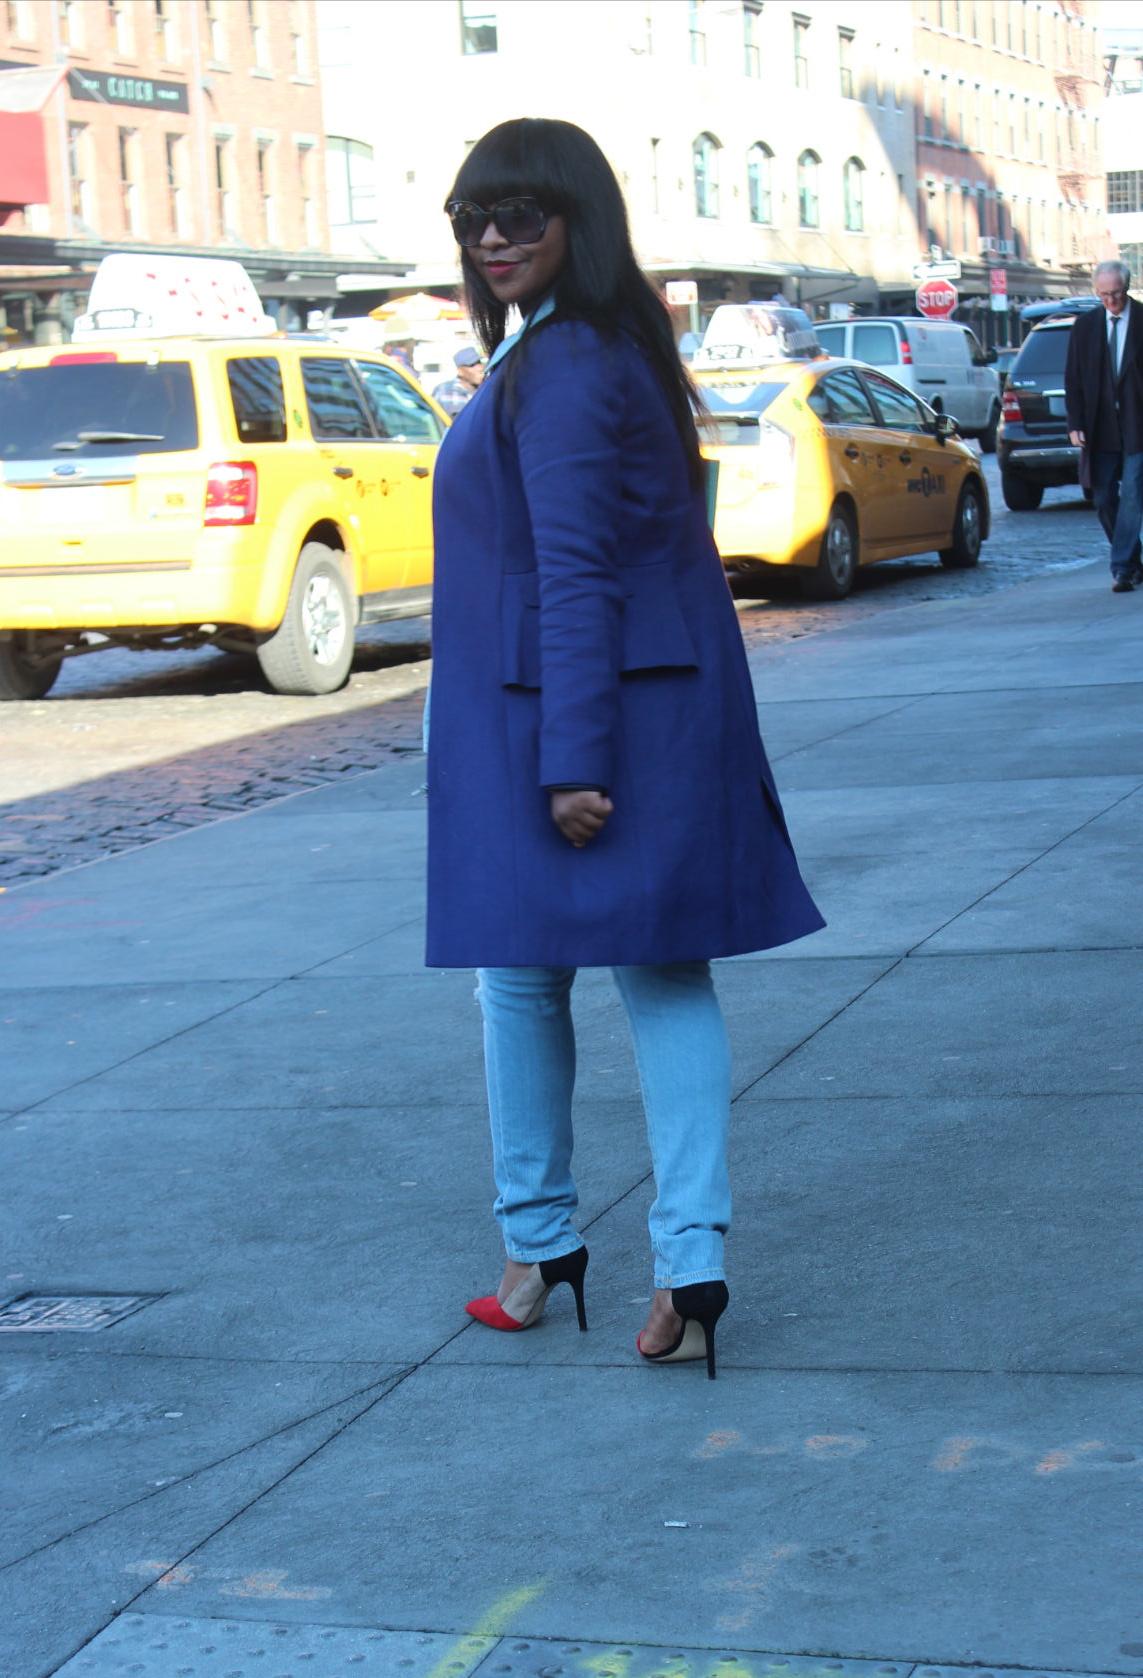 NYC_0009.jpg